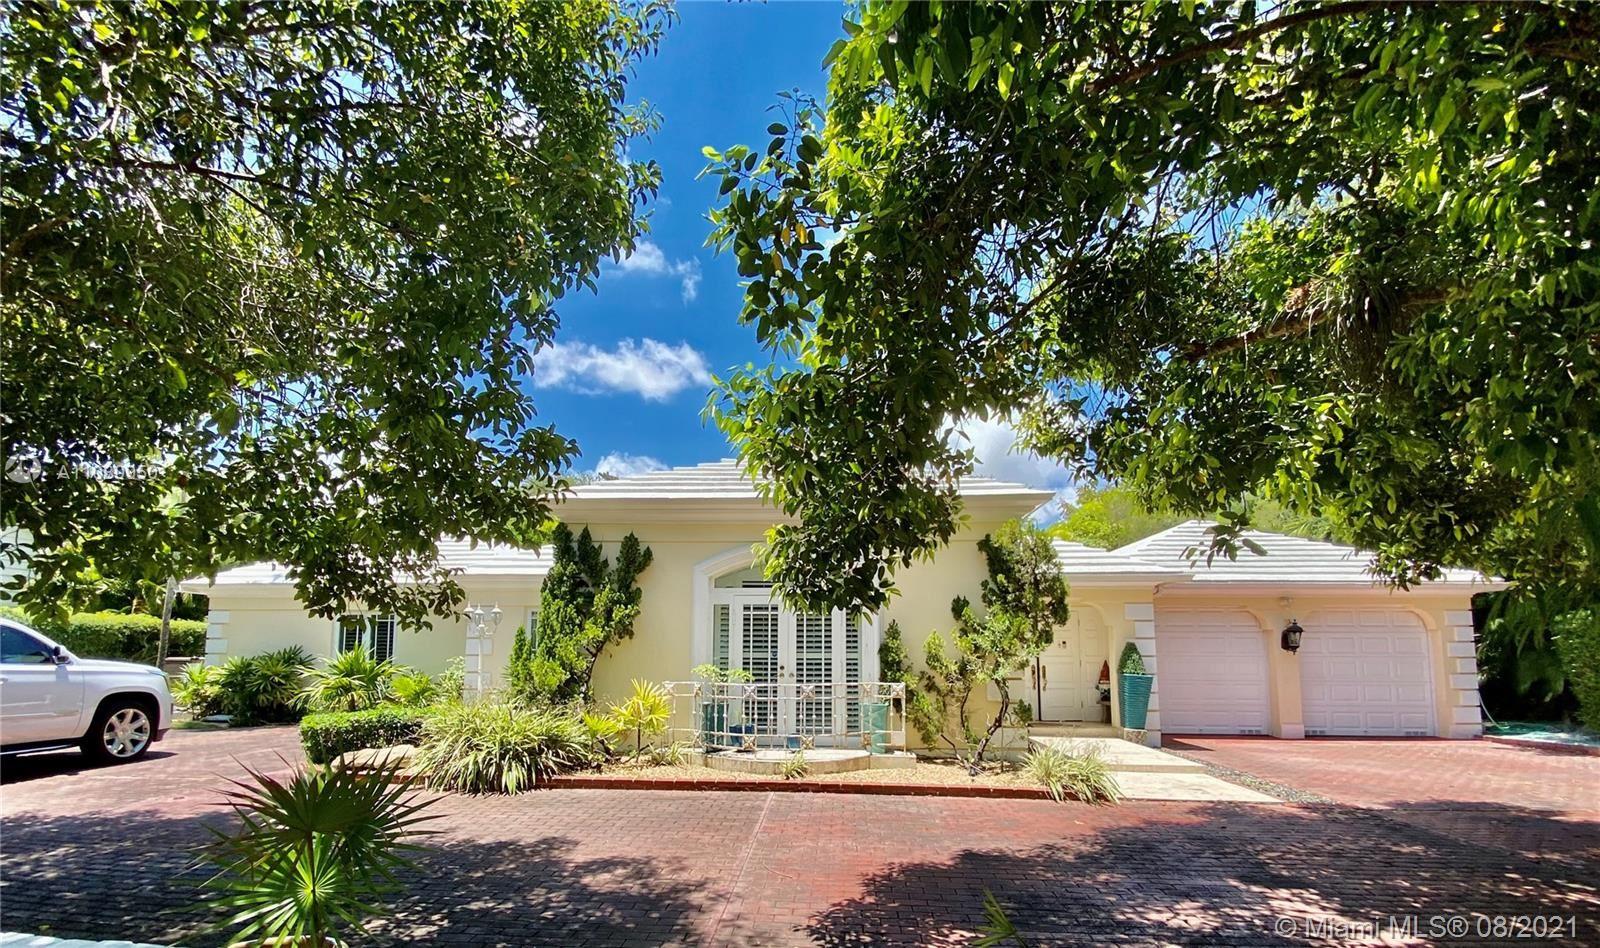 1361 Alegriano Ave, Coral Gables, FL 33146 - #: A11080950